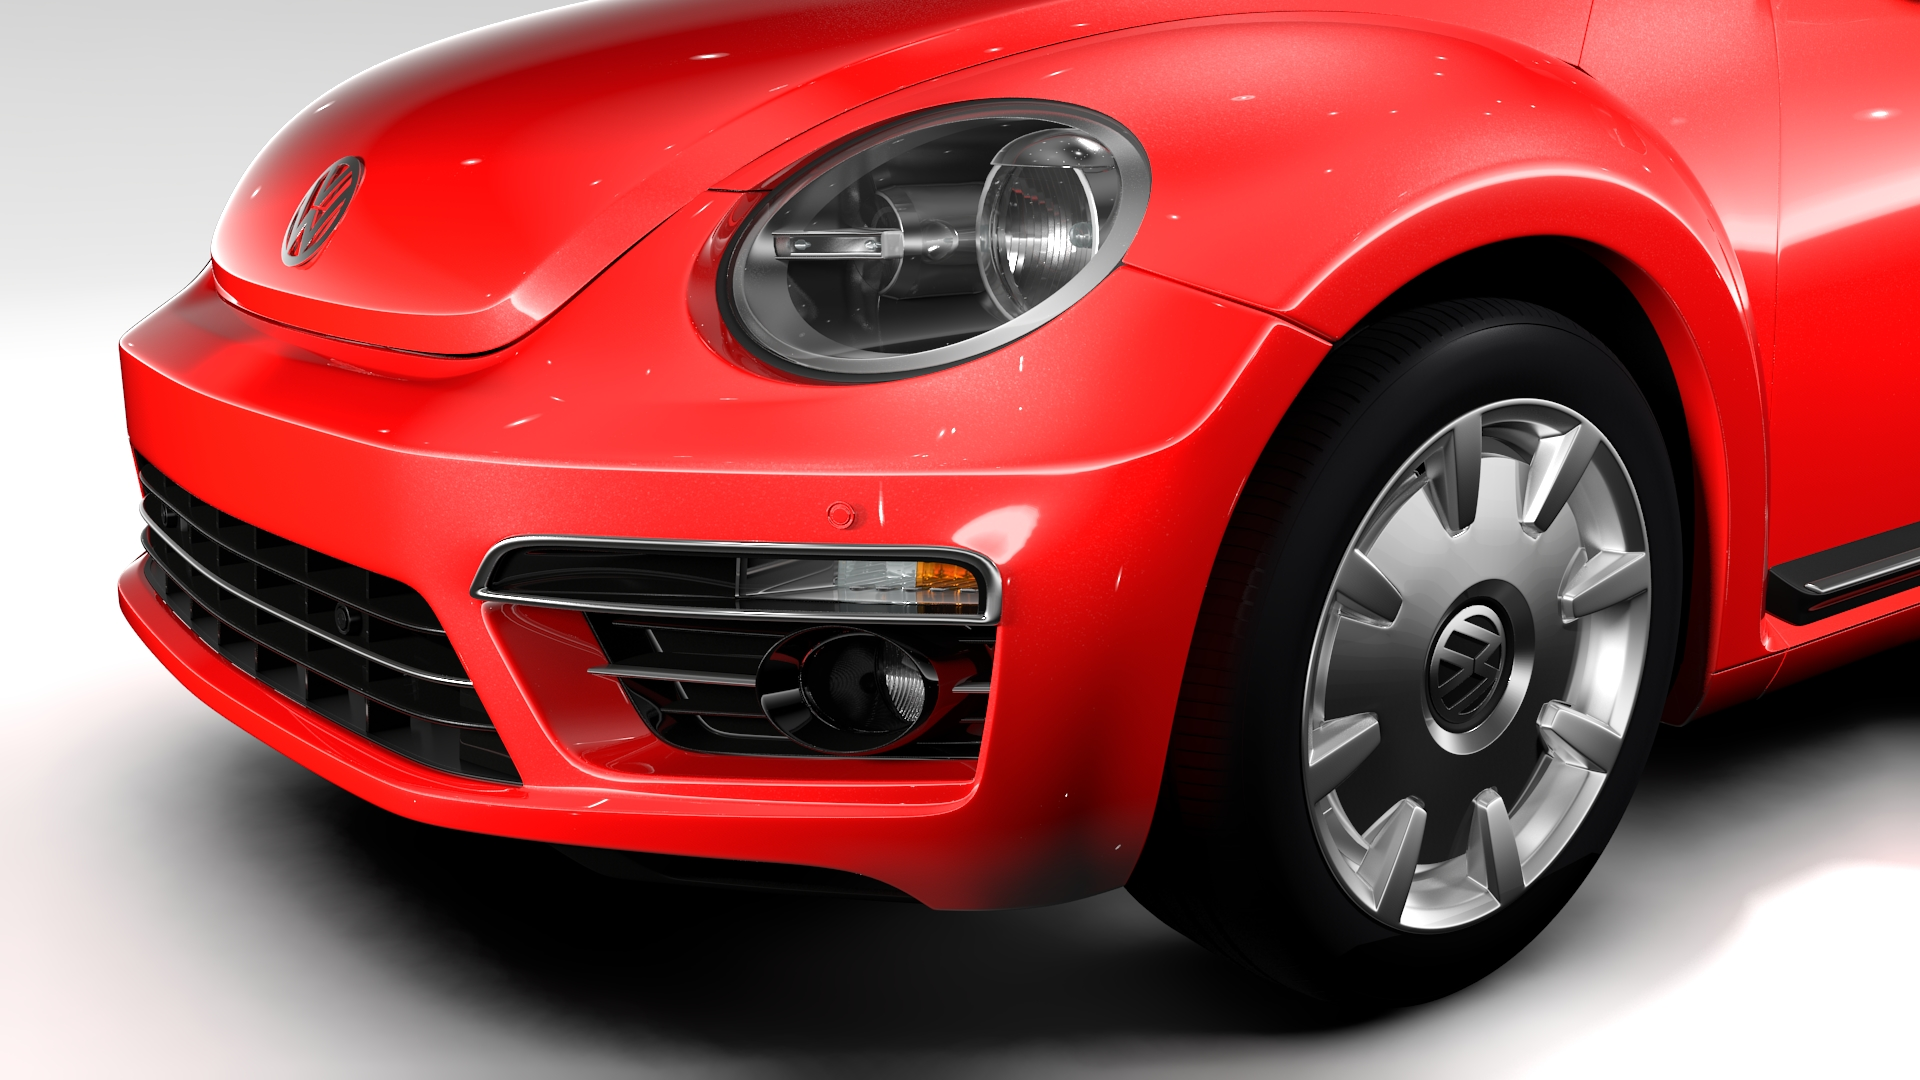 vw beetle turbo 2017 3d model 3ds max fbx c4d lwo ma mb hrc xsi obj 221659